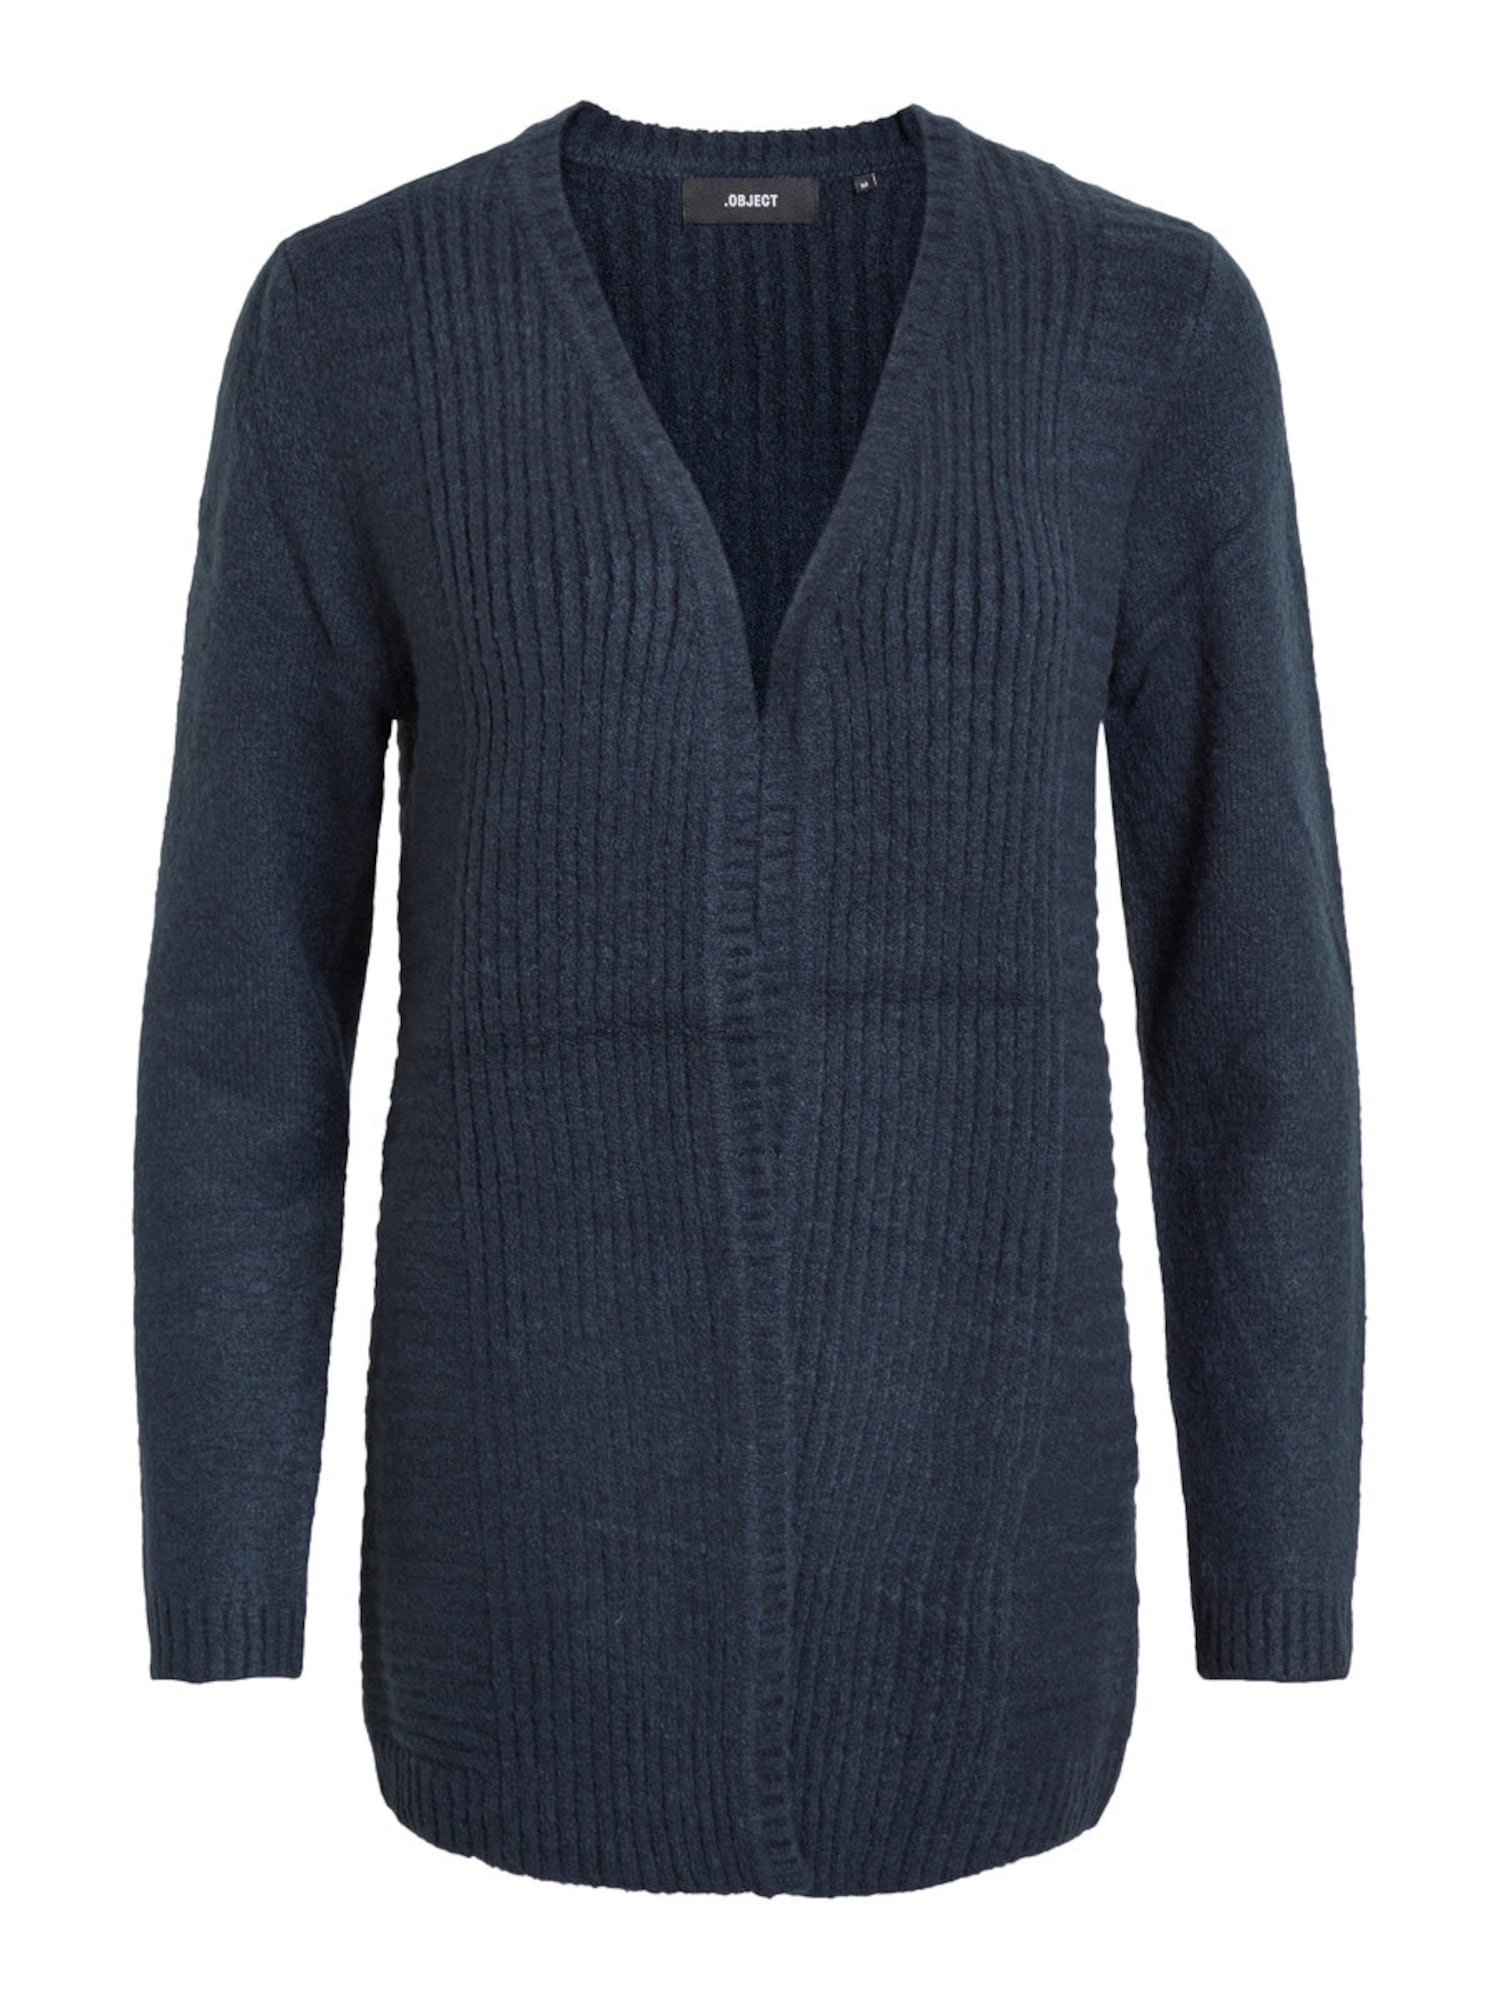 Cardigan 'OBJNONSIA' | Bekleidung > Pullover > Sonstige Pullover | OBJECT